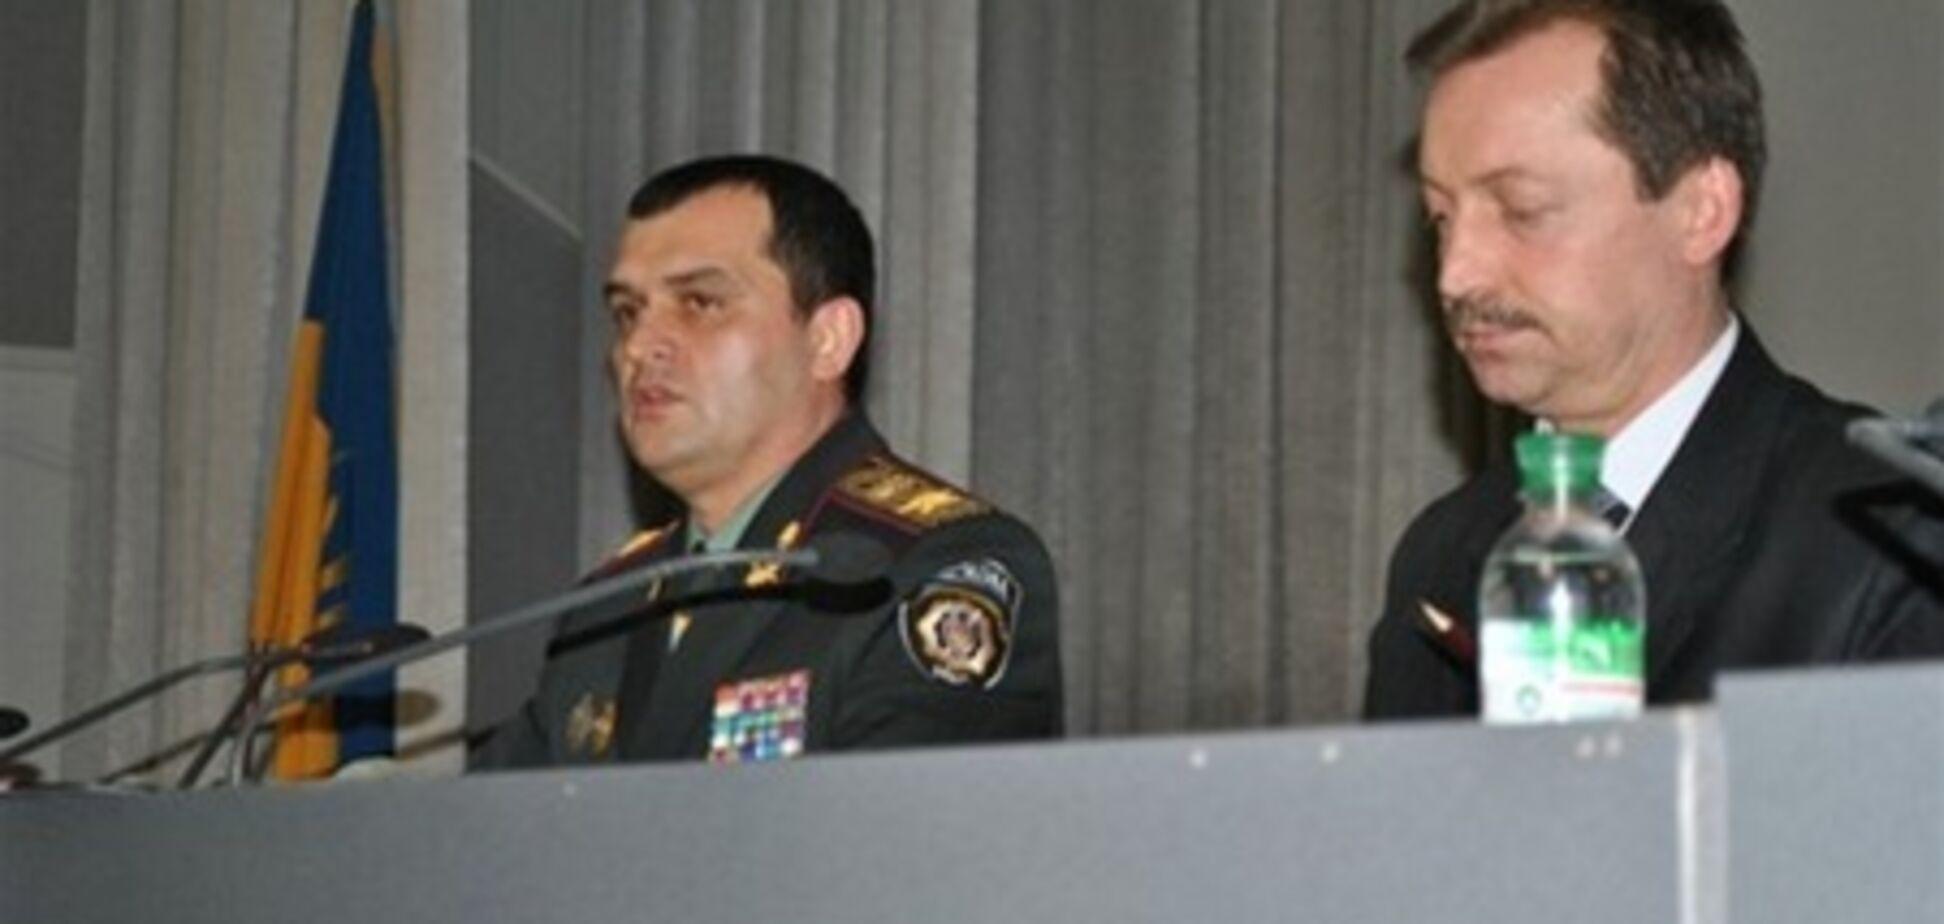 Захарченко: надо менять менталитет милиционера